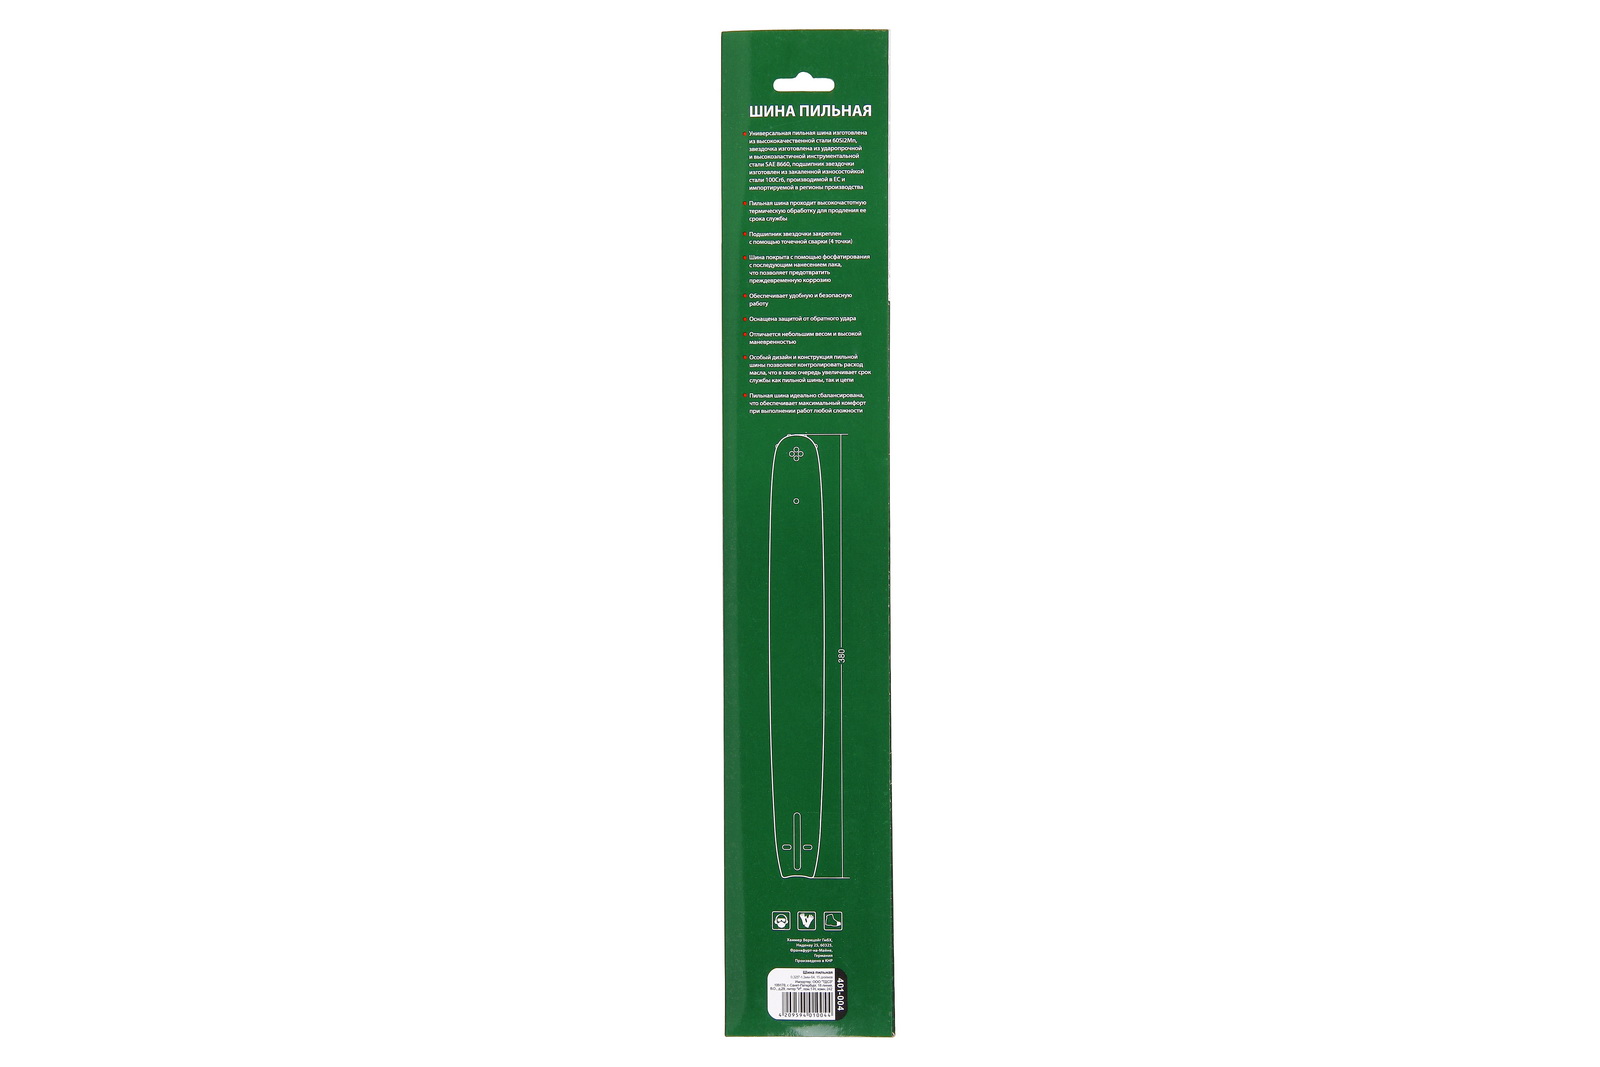 Шина цепной пилы Hammer 401-004 0,325''-1,3 мм-64, 15 дюймов